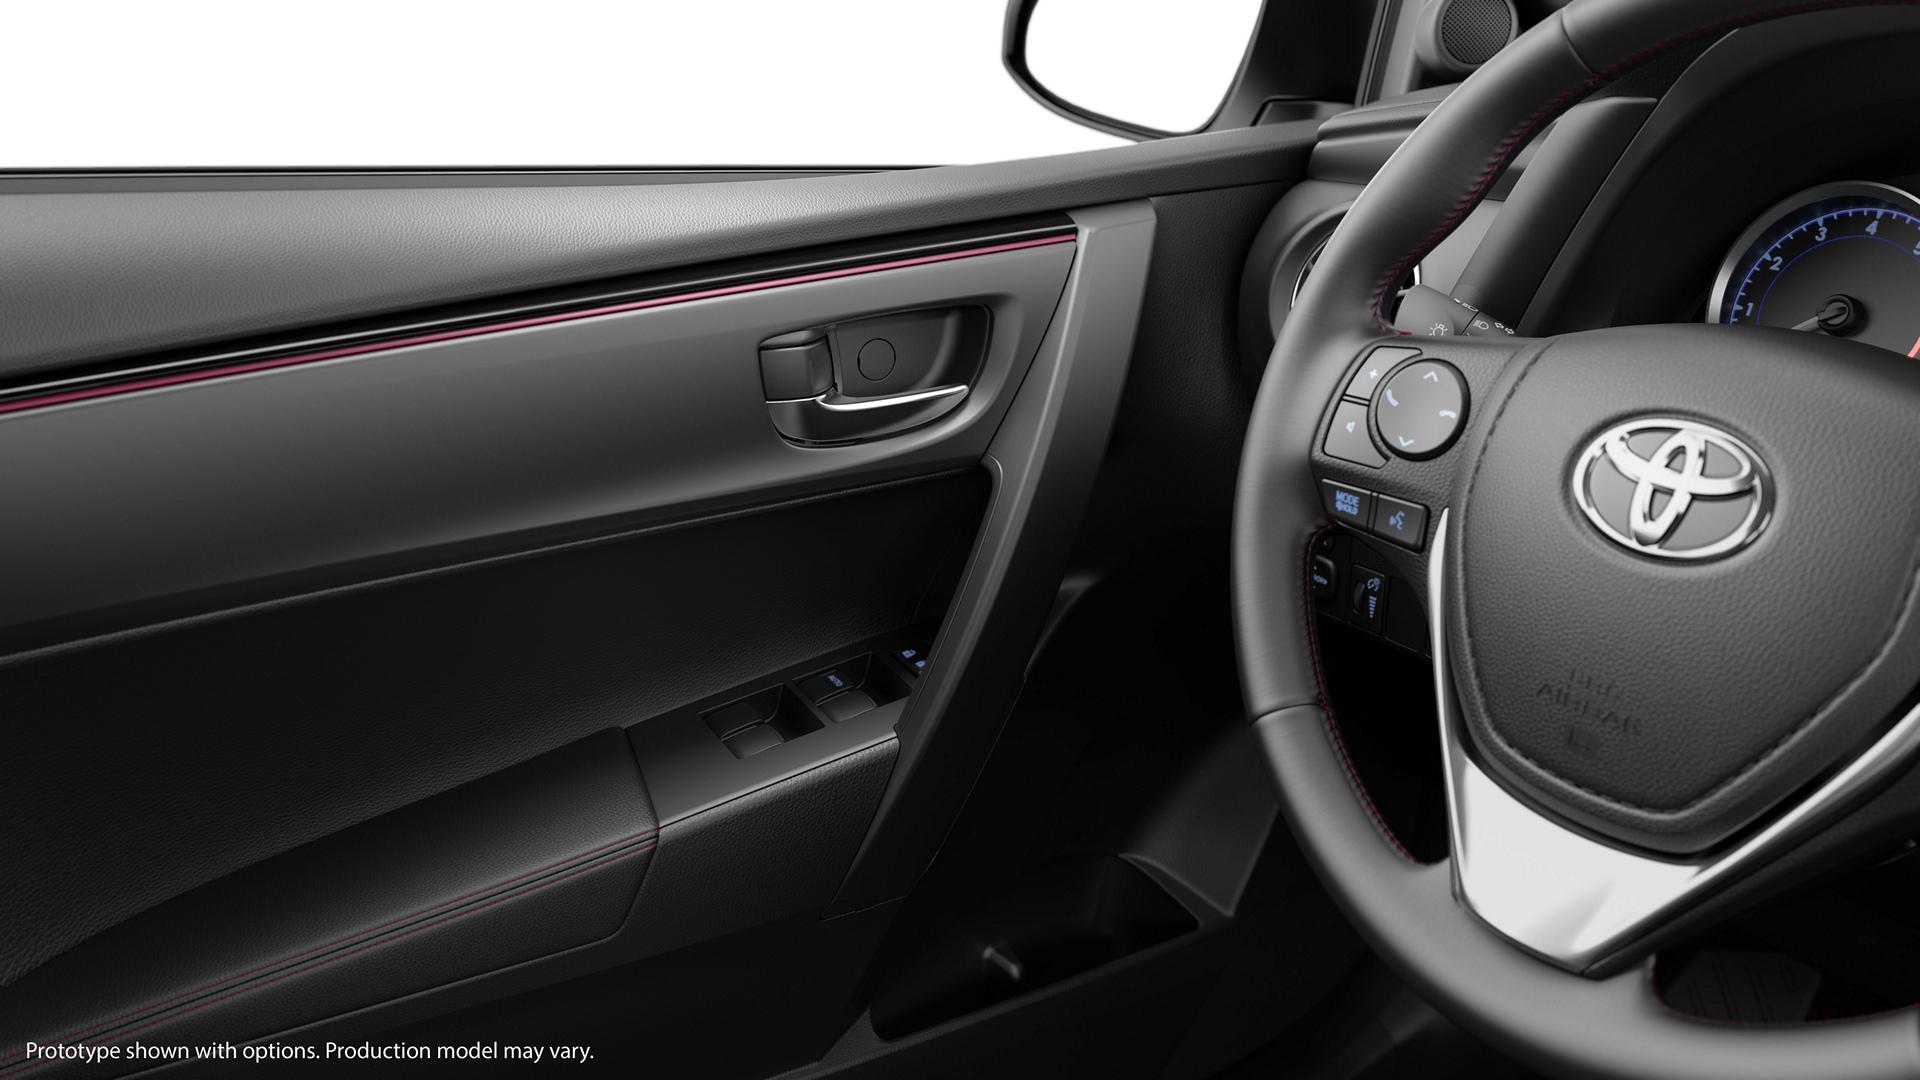 2017 Toyota Corolla 50th Anniversary Special Edition © Toyota Motor Corporation